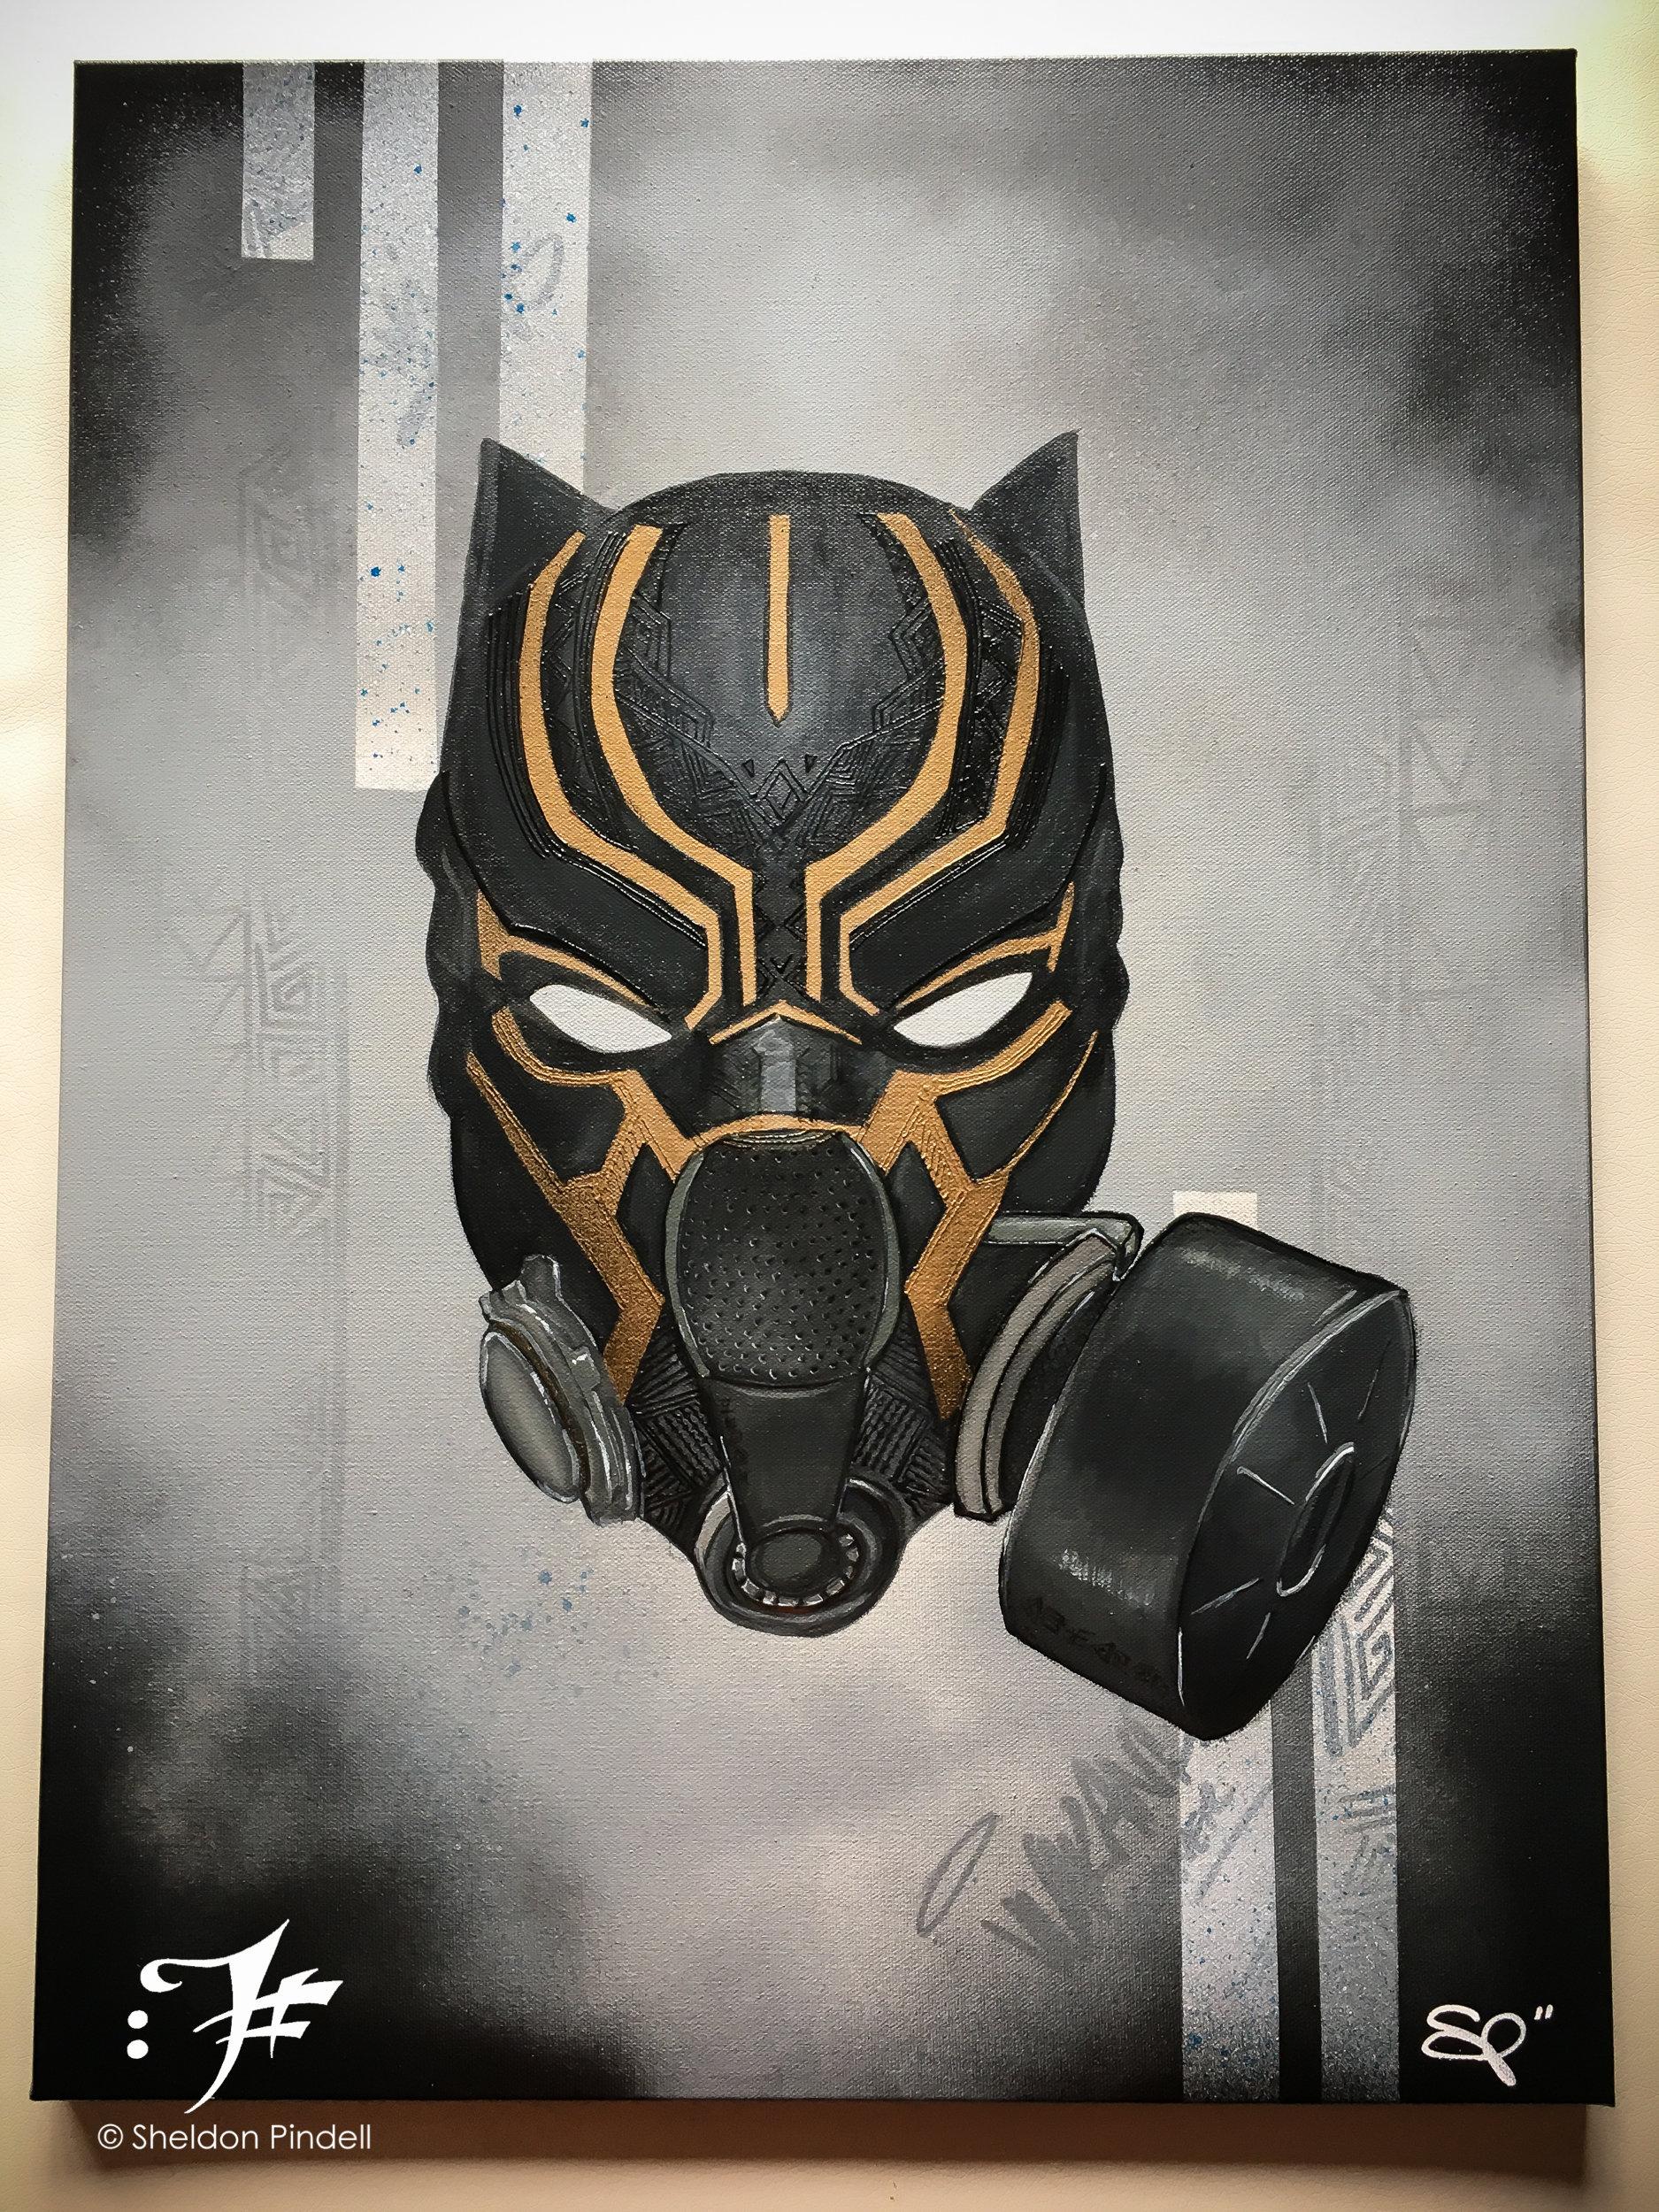 AvengersMarvel Dessinée Panther PersonnaliséeArtgang ArtBande CollectionArt ComicsOr Masque À De Black MarvelStreet GazPersonnage 9WEHI2D